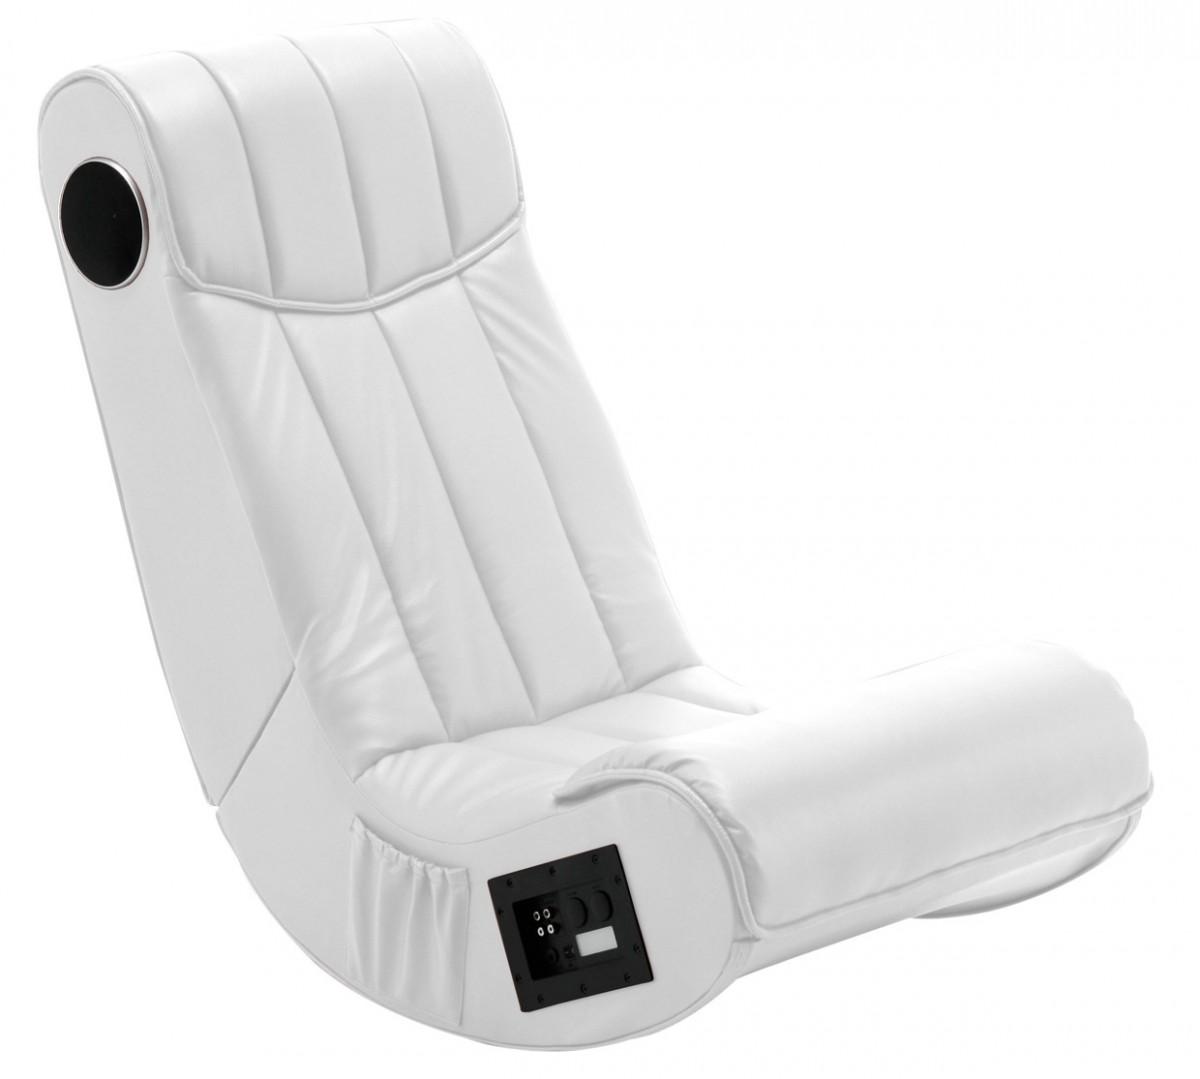 Folding Gaming Sound Chair Rocker Music White 2.1 Sound